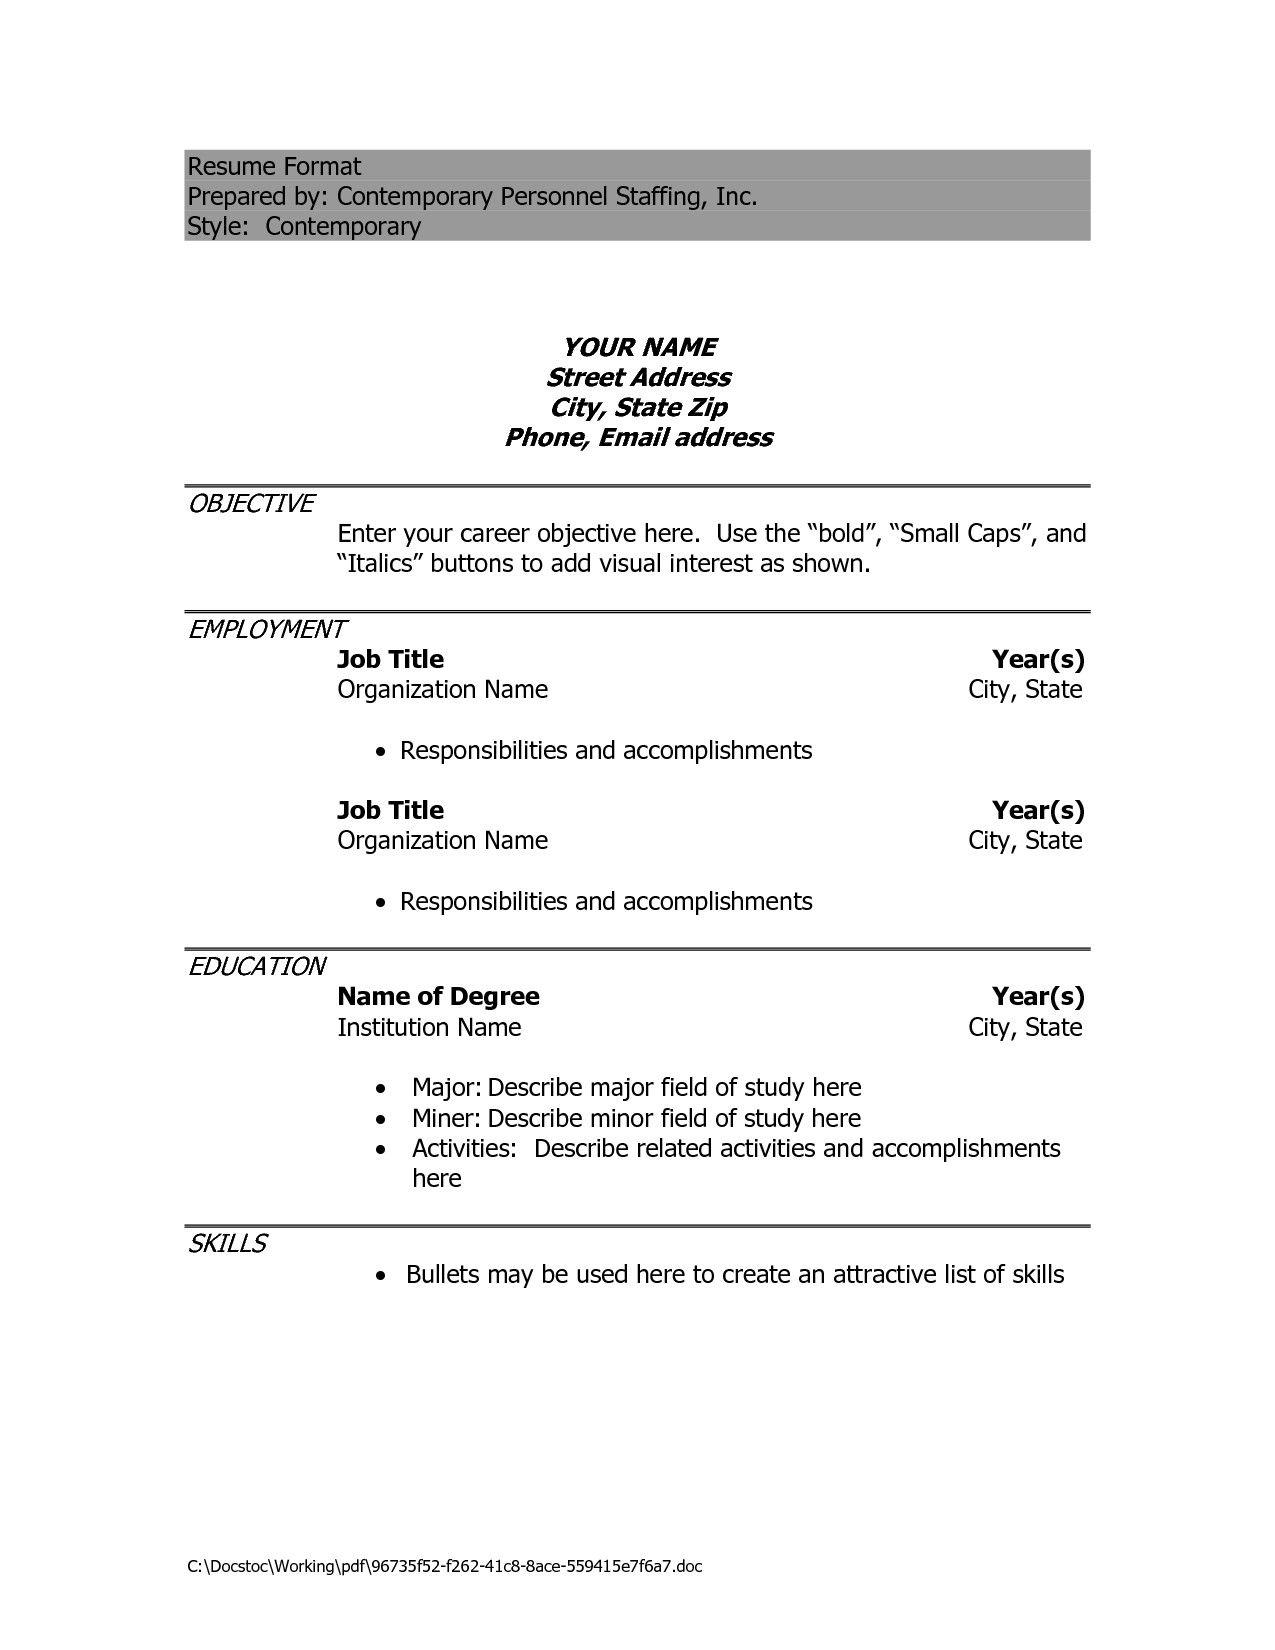 Student Resume Template Google Docs Stunning Resume